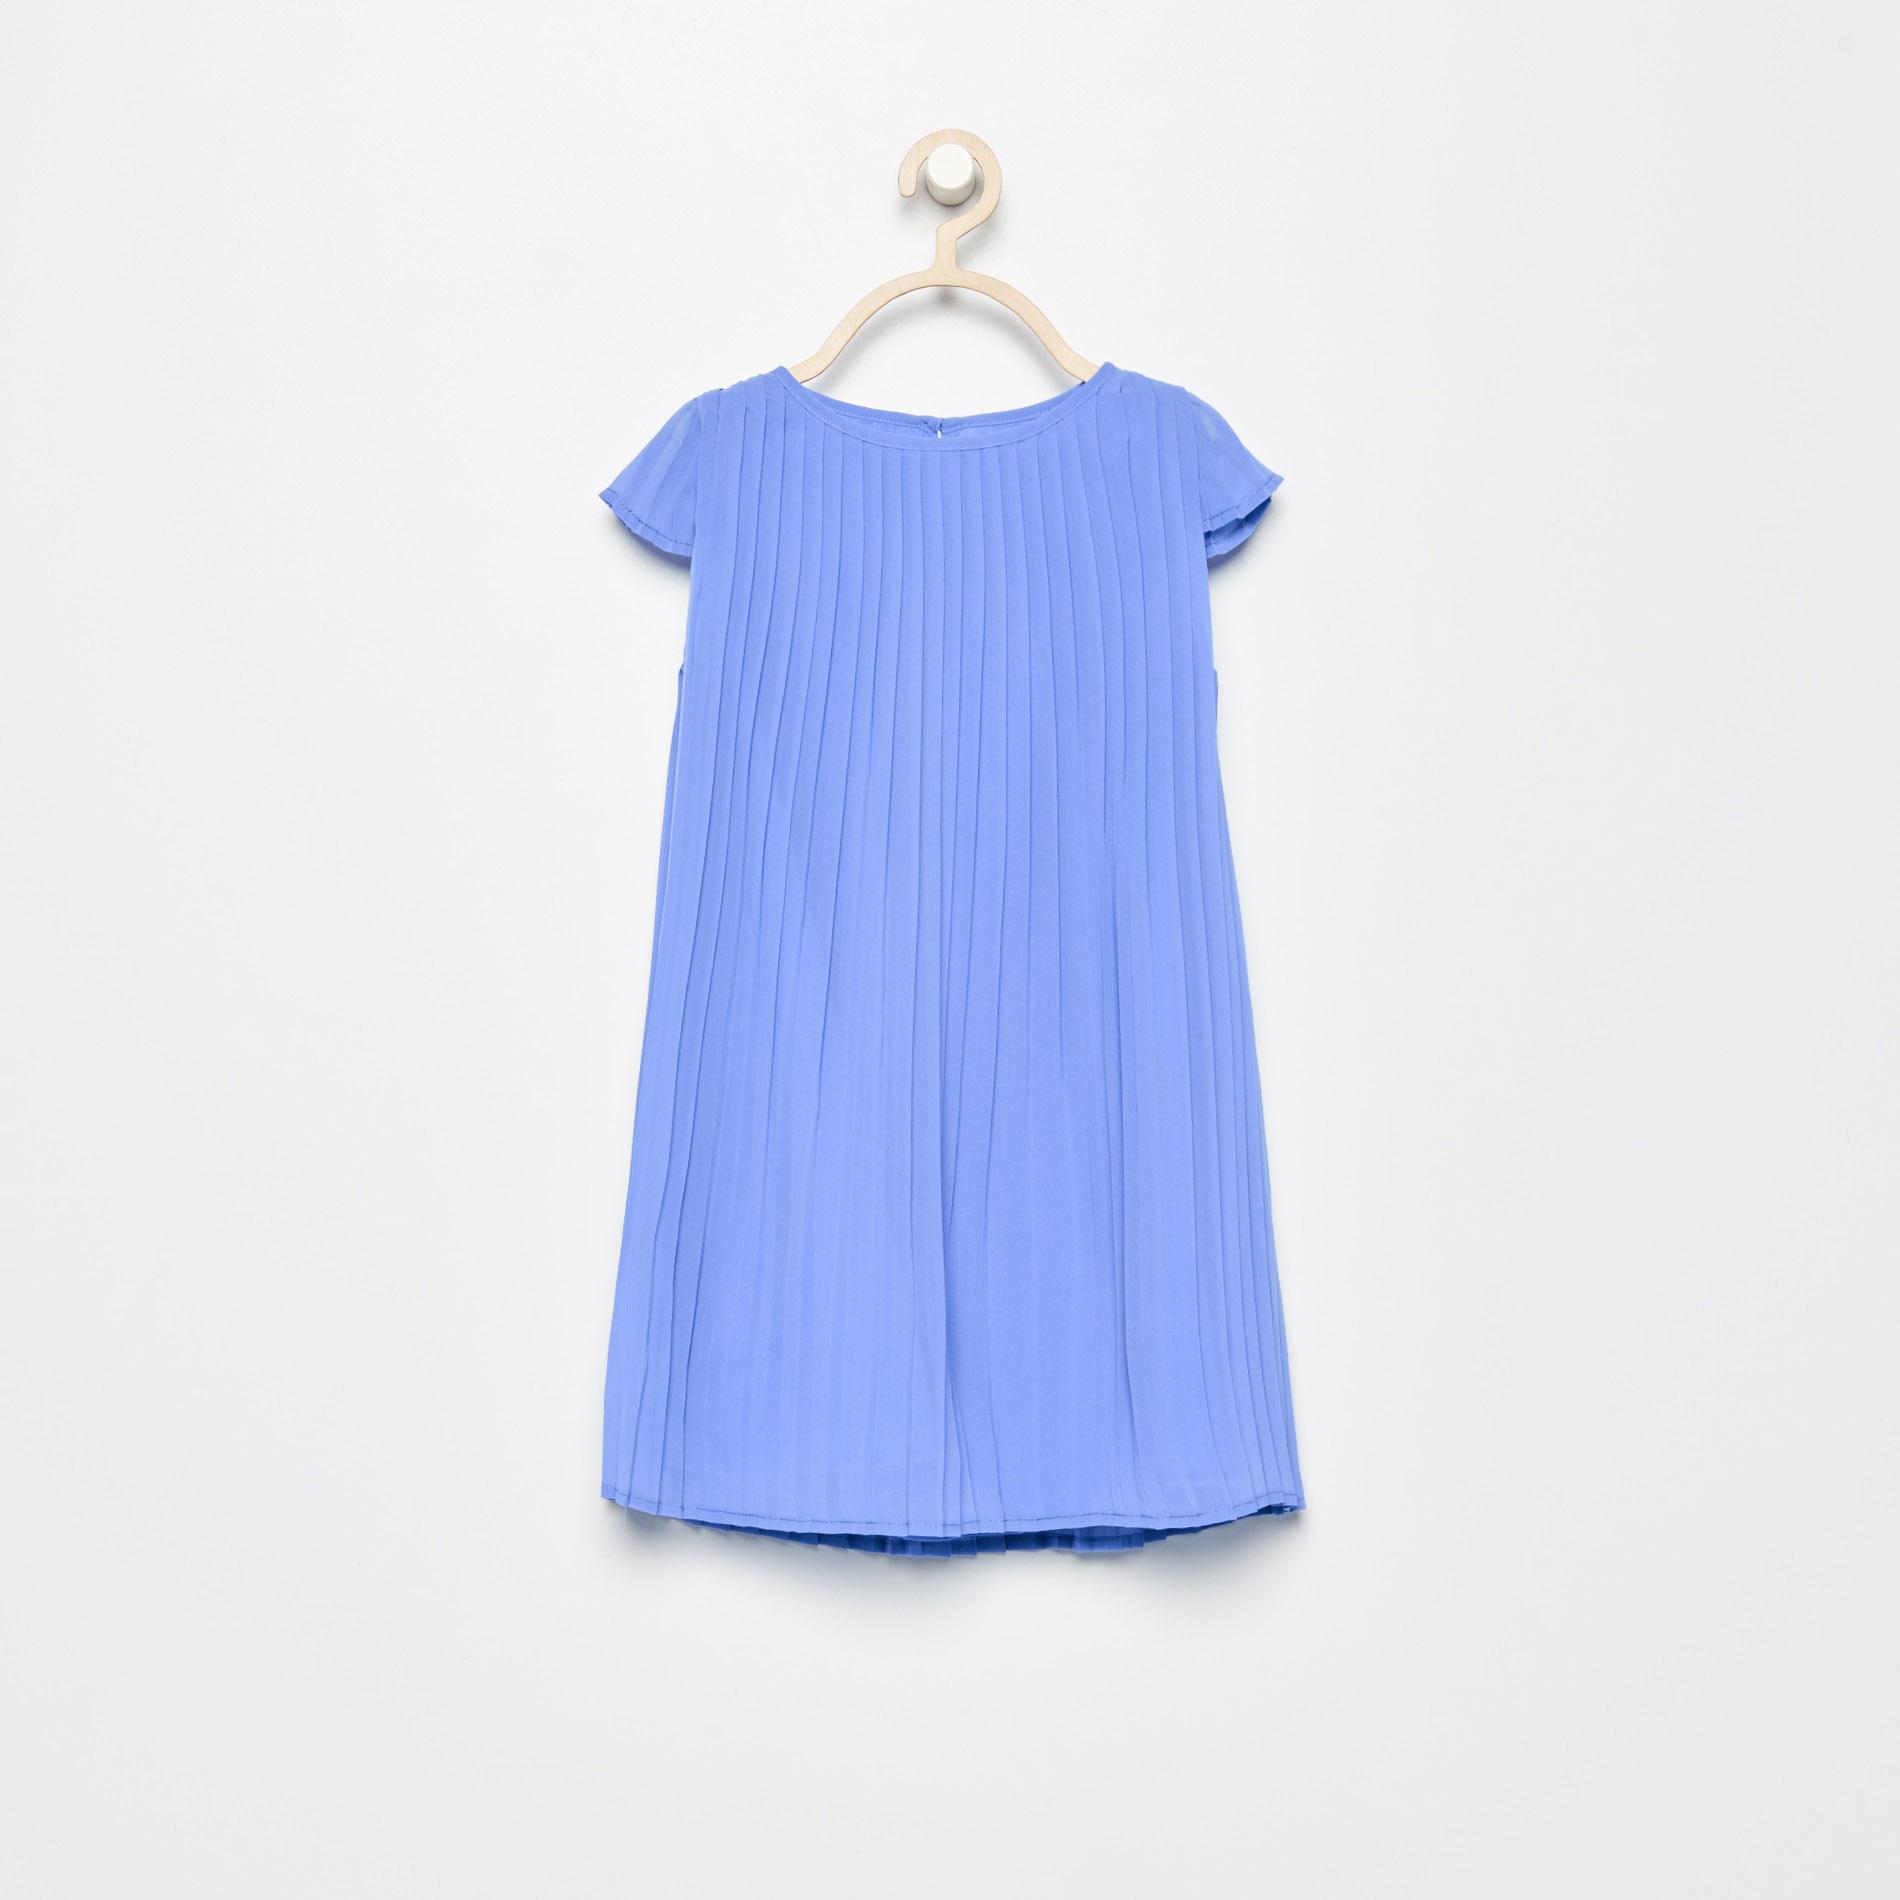 b20dfa537c RESERVED sukienka chaber 122 cm - 7223970654 - oficjalne archiwum ...